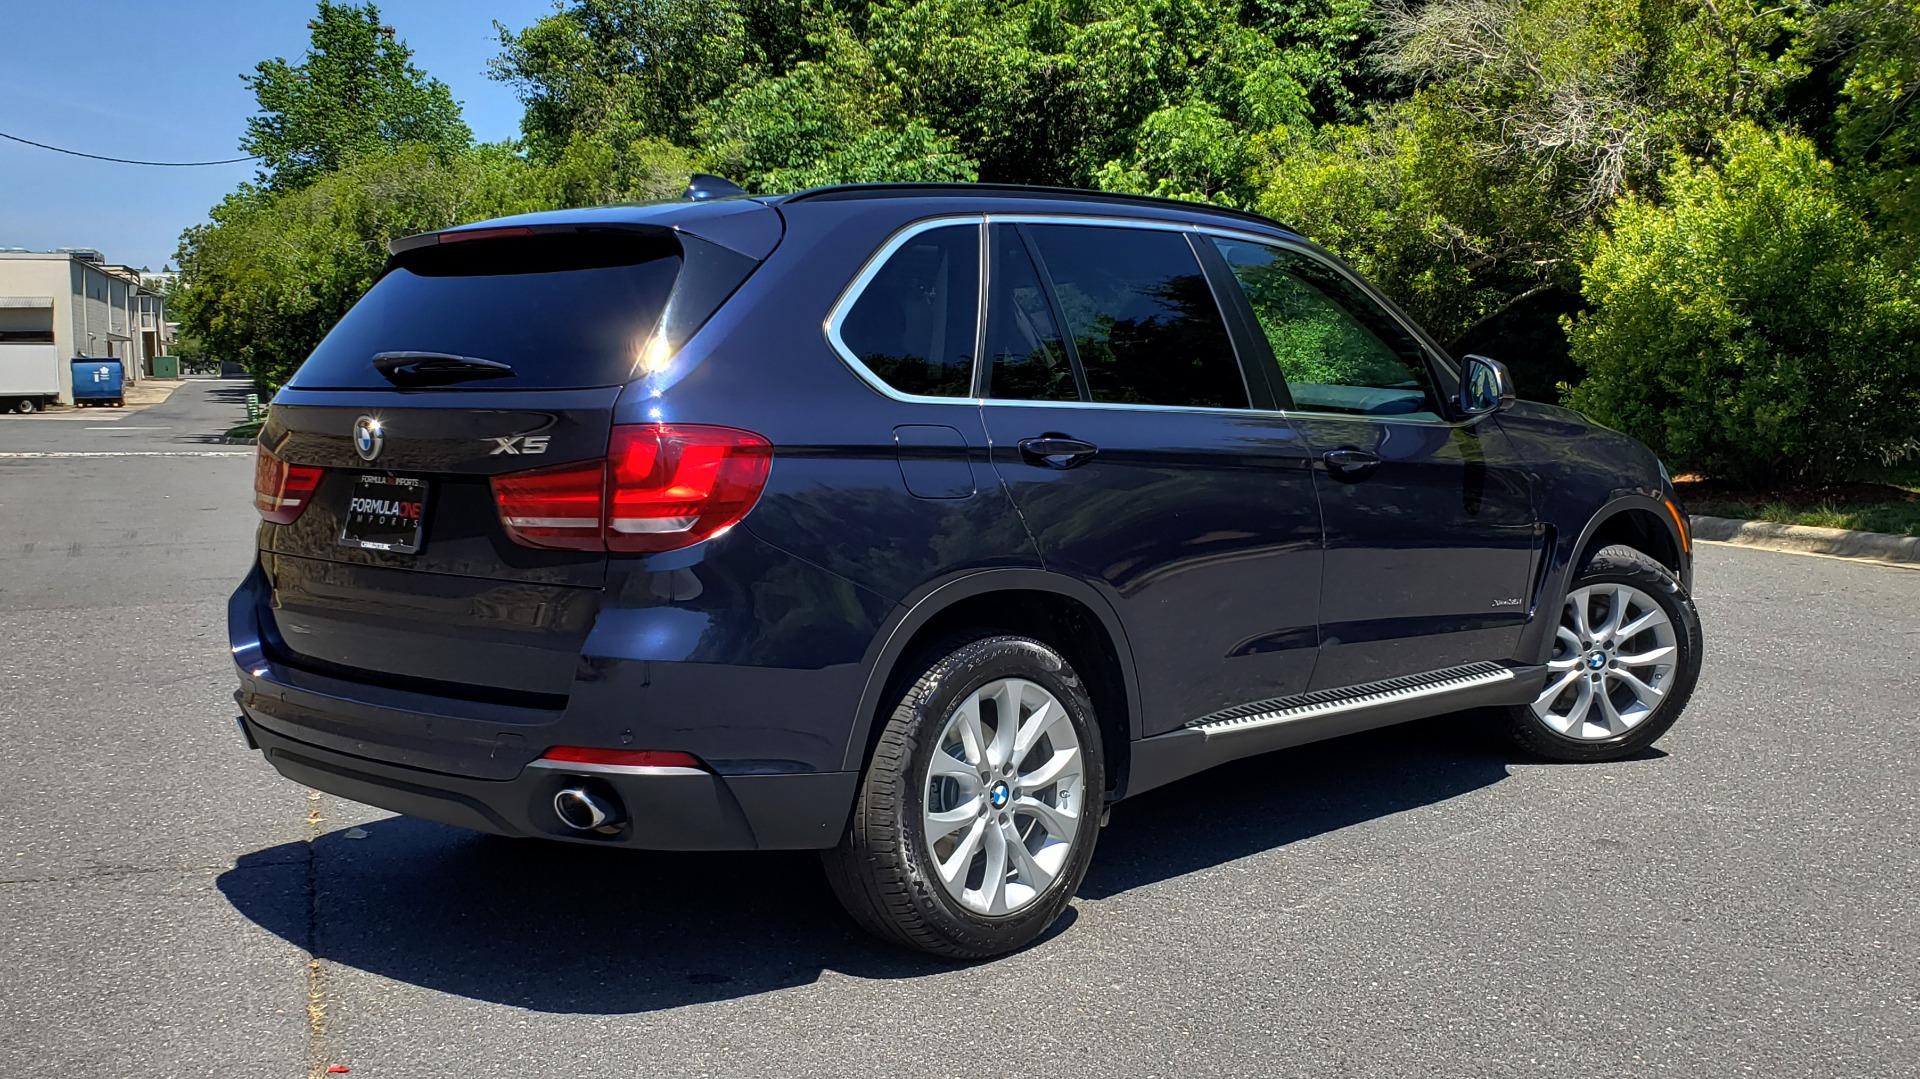 Used 2016 BMW X5 XDRIVE35I / PREM PKG / NAV / DRVR ASST PLUS / REARVIEW for sale $25,765 at Formula Imports in Charlotte NC 28227 6